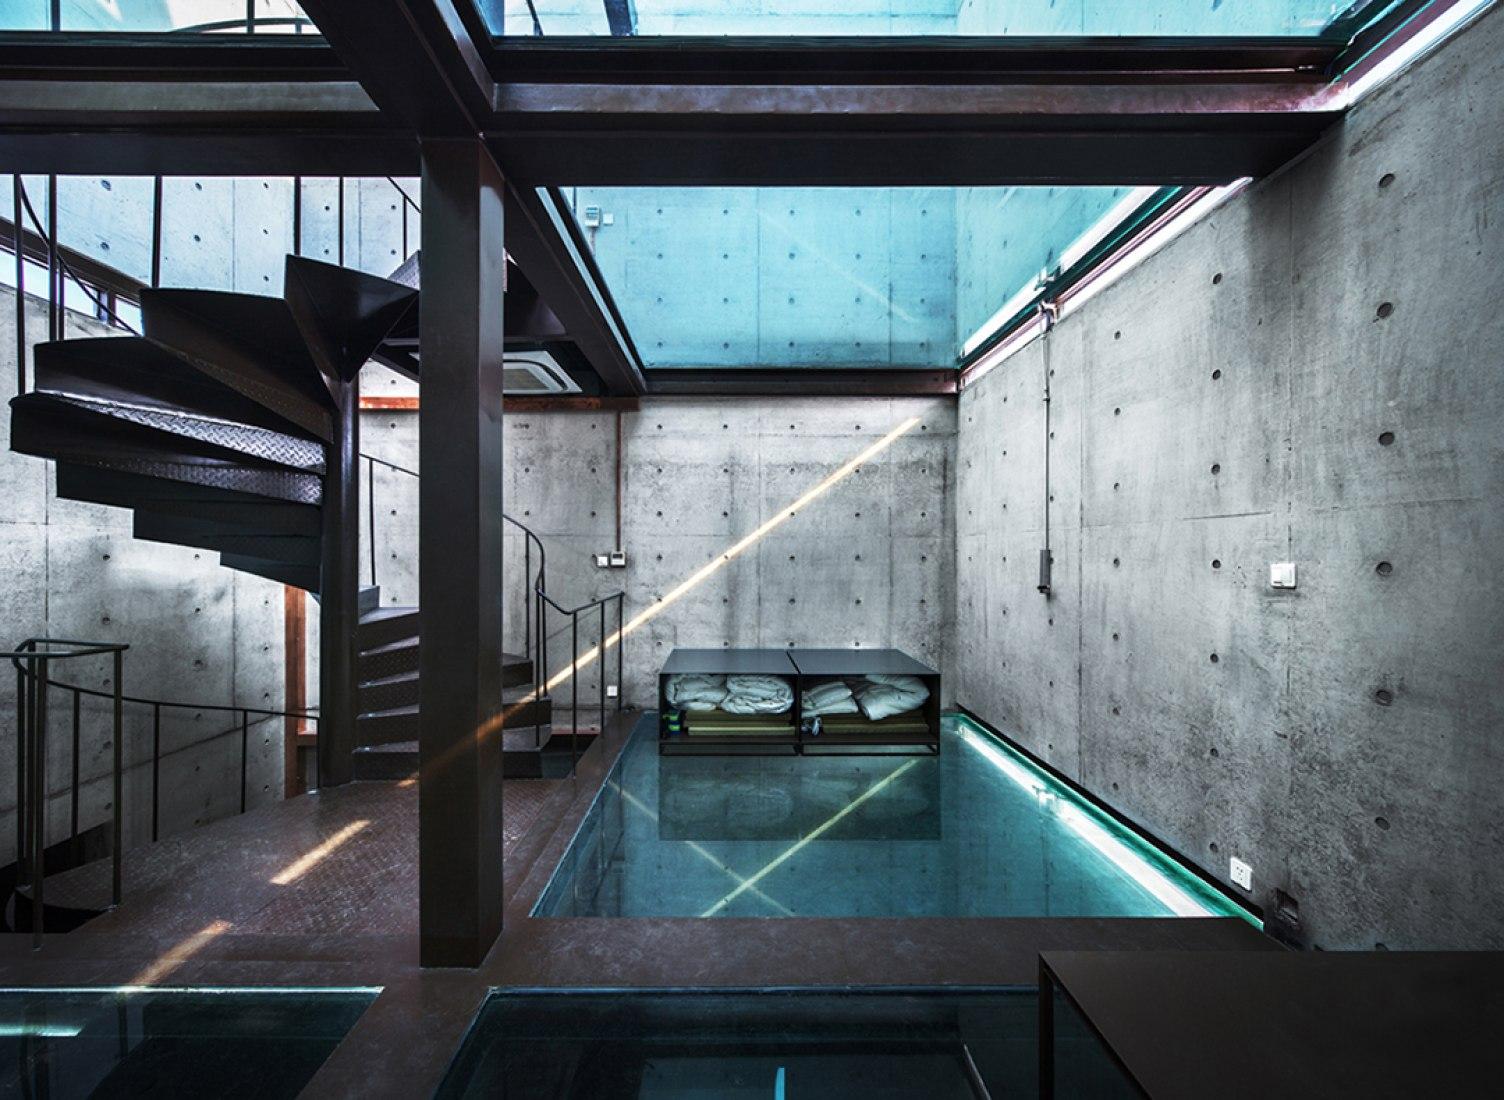 Interior. Image courtesy of Atelier FCJZ.